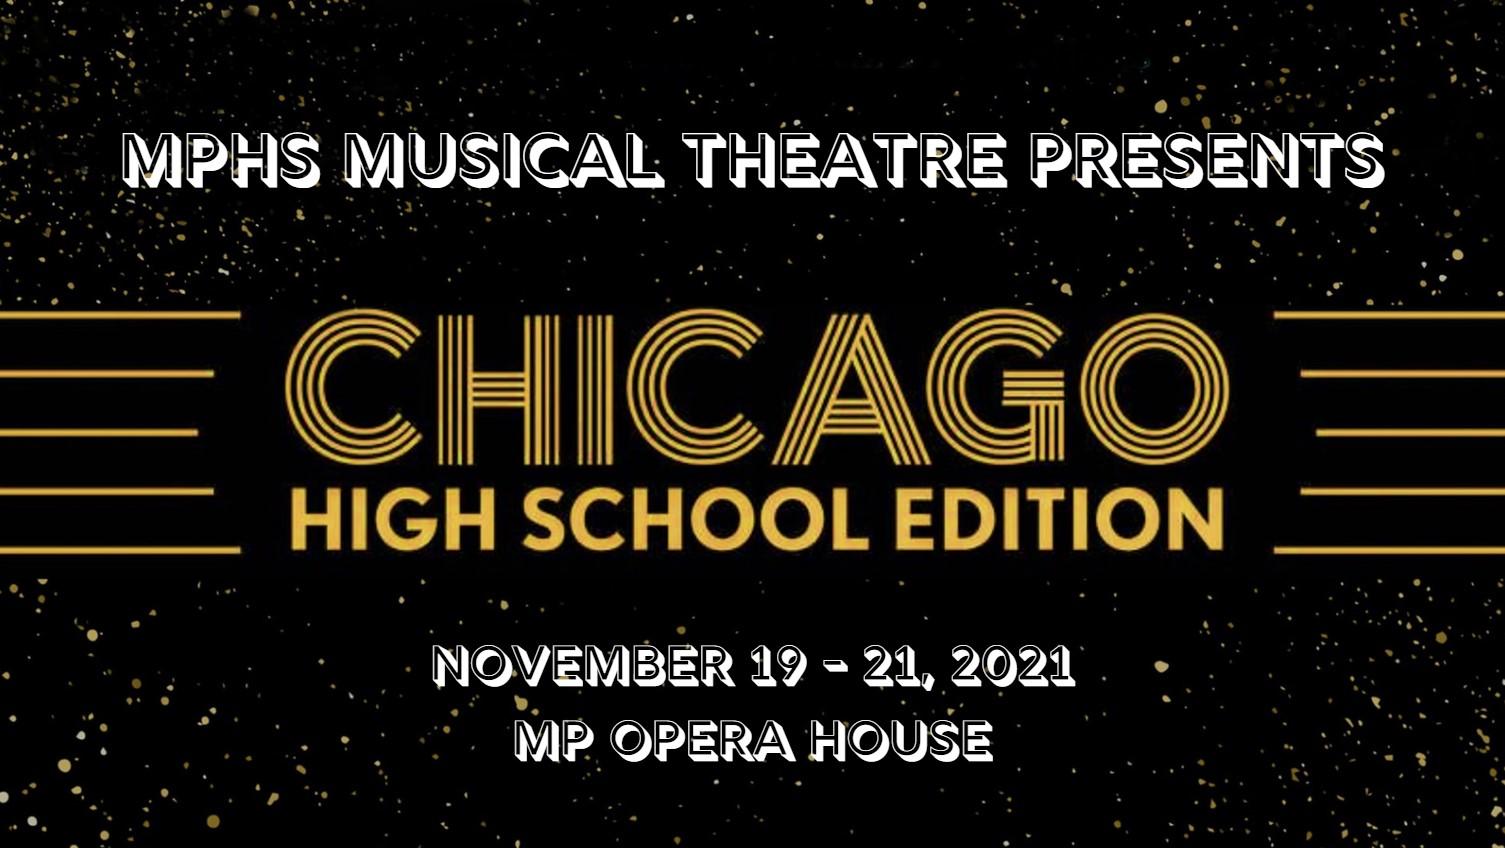 Chicago - High School Edition